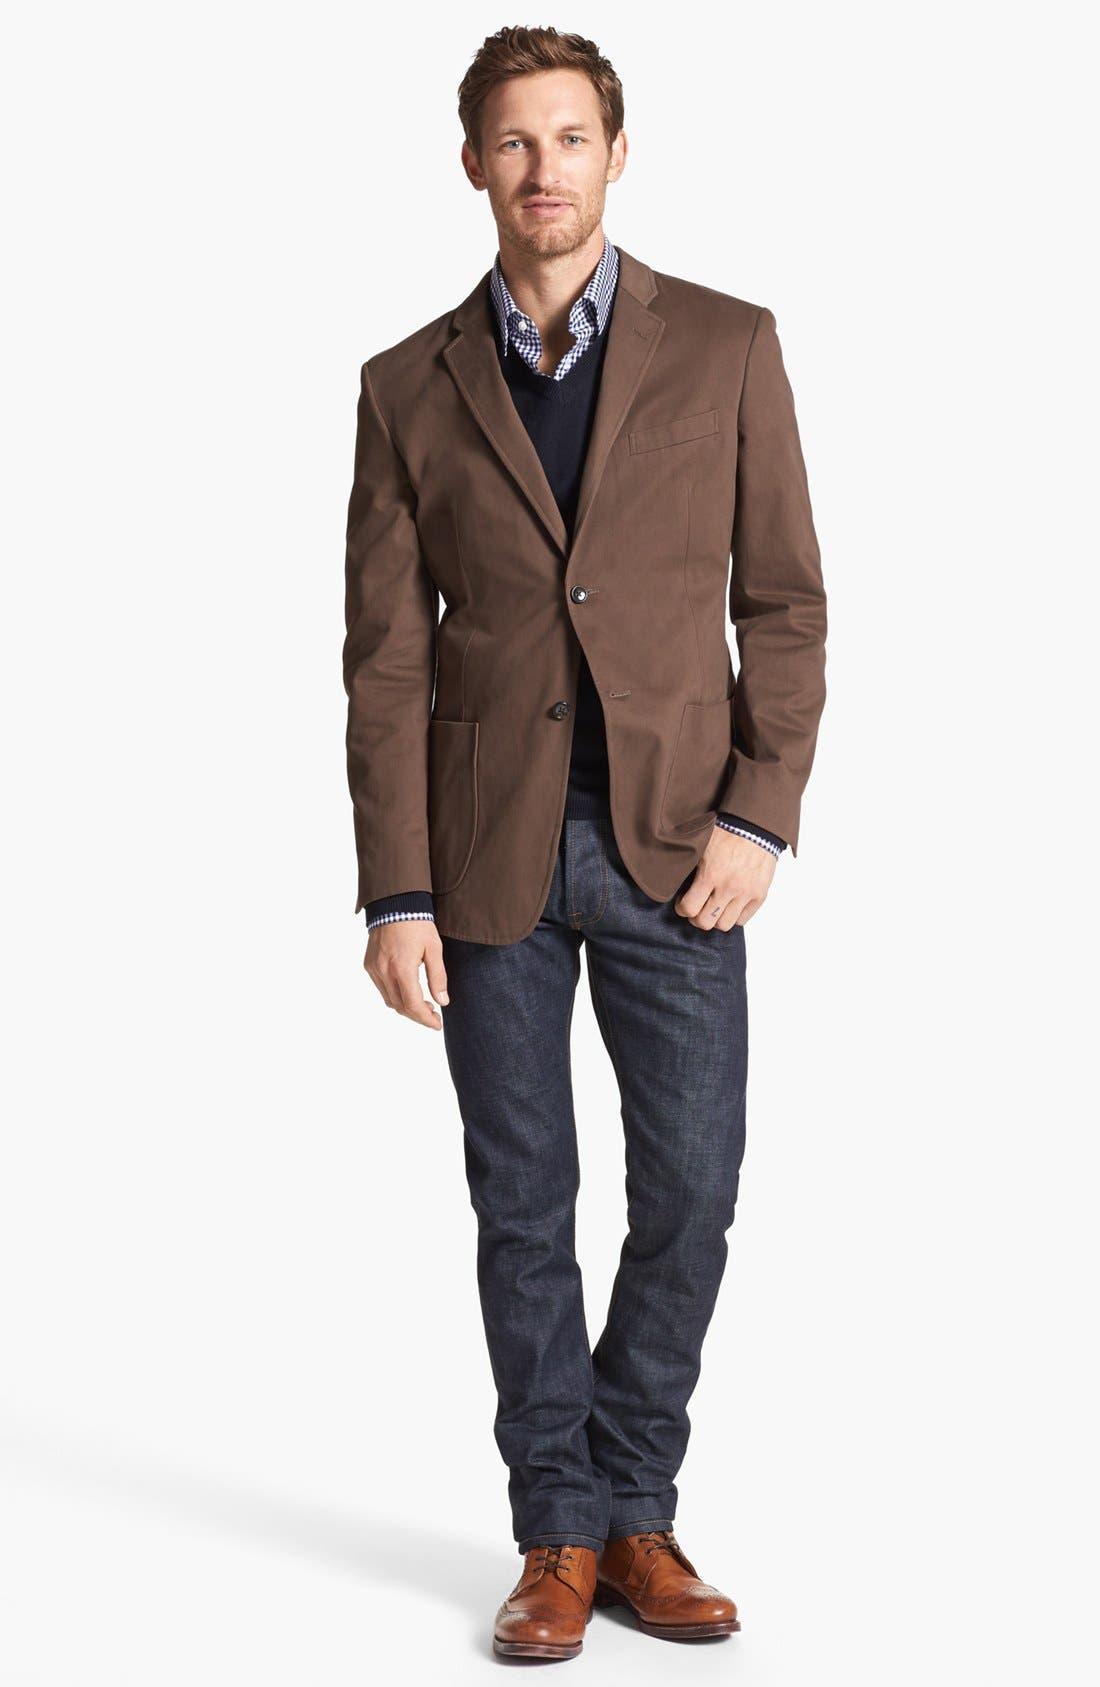 Alternate Image 1 Selected - Wallin & Bros. Extra Trim Fit Cotton Twill Blazer